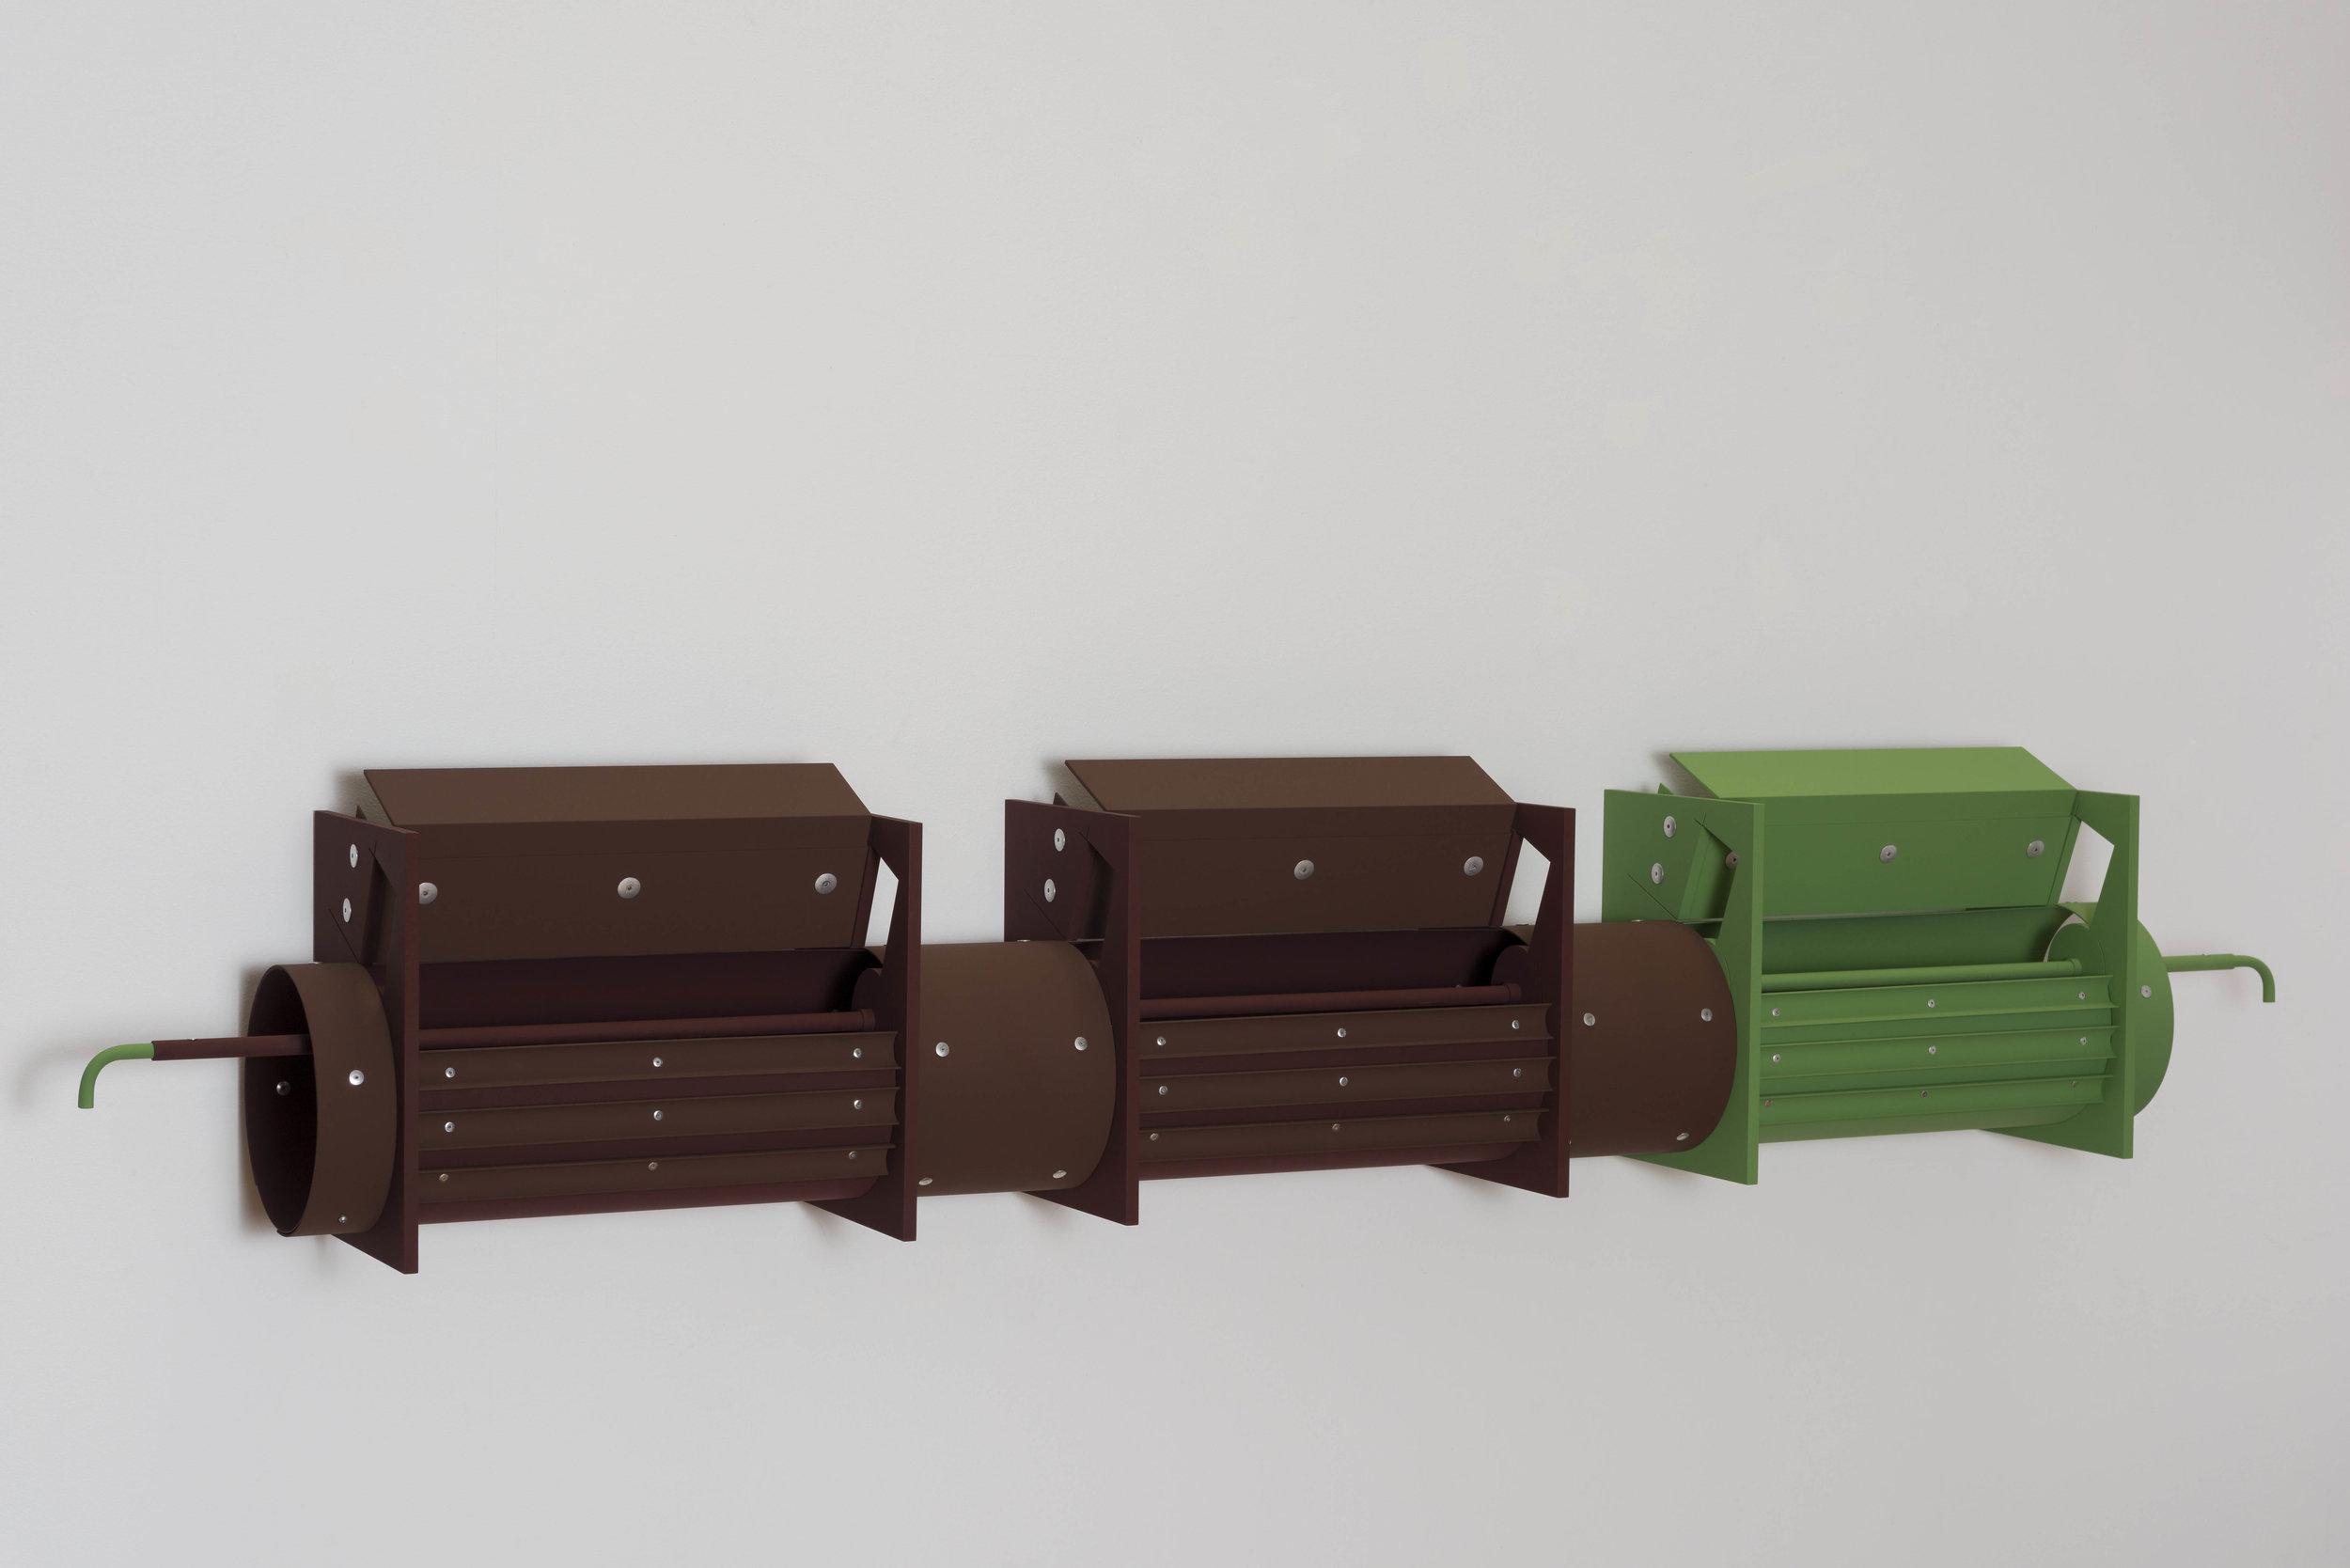 Matt Paweski,  Fountain , 2018, aluminum, aluminum rivets, vinyl paint, 14 × 78 × 8 inches (35.6 × 198.1 × 20.3 cm)